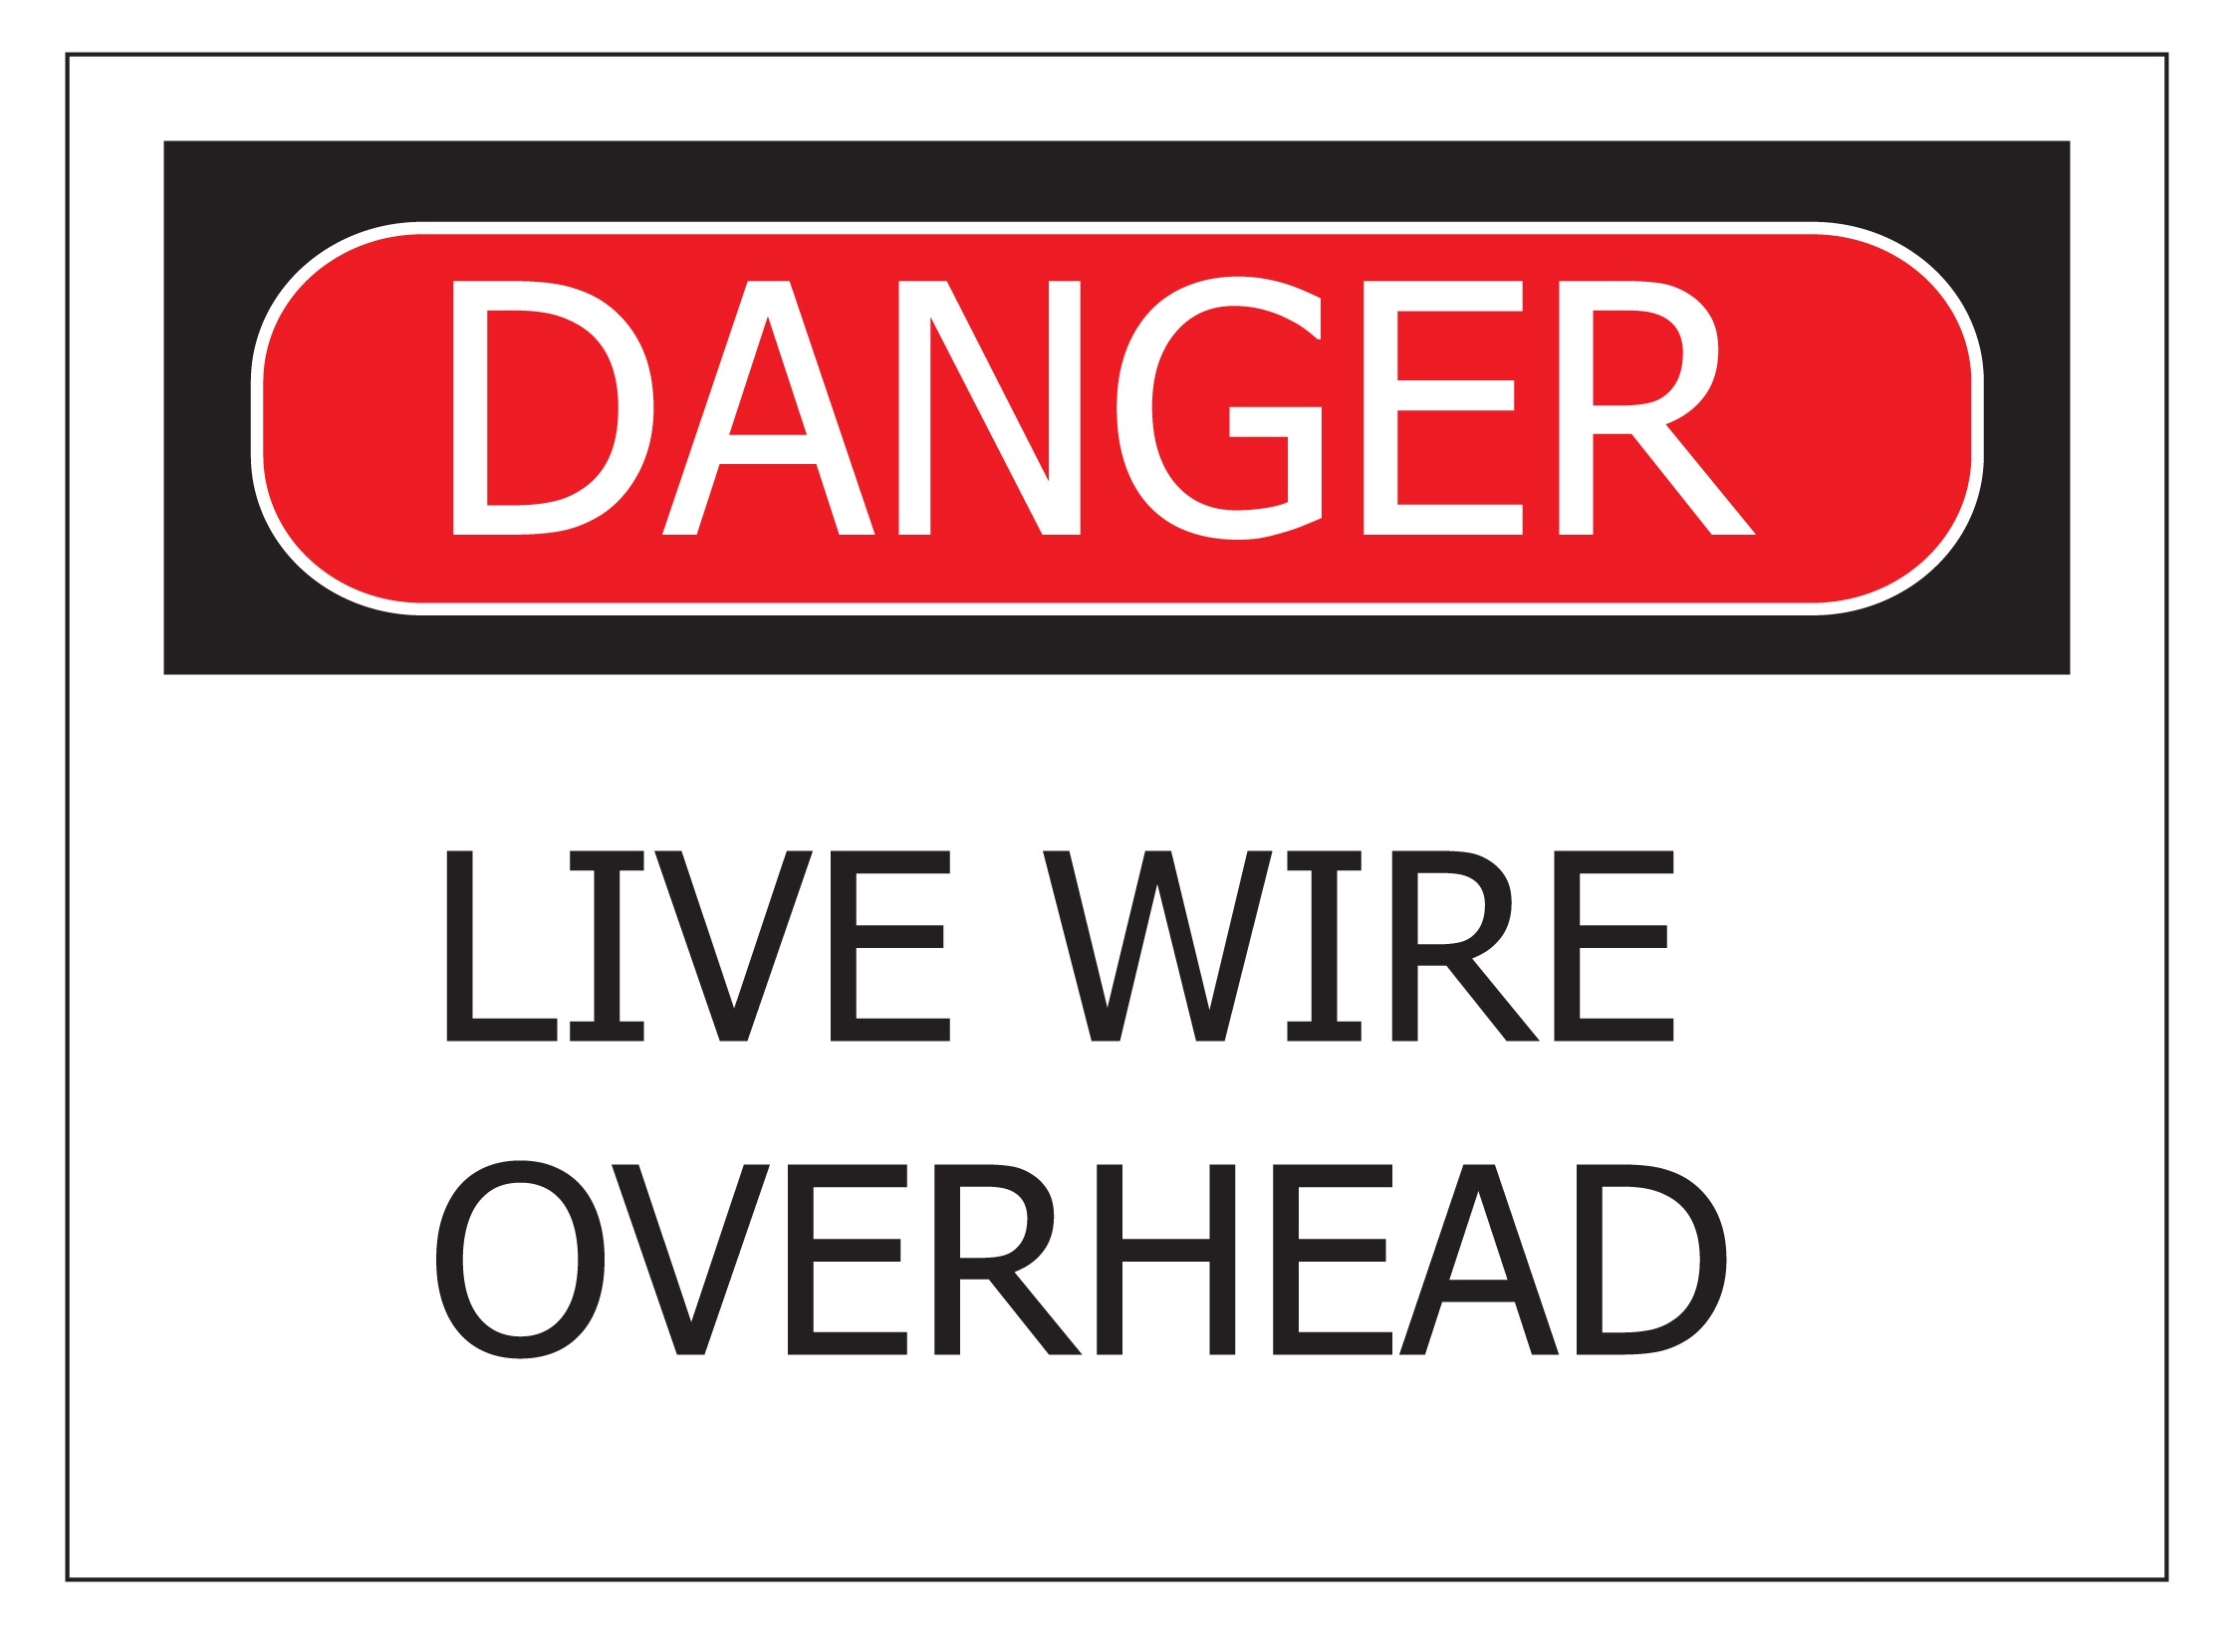 Danger live wire overhead.